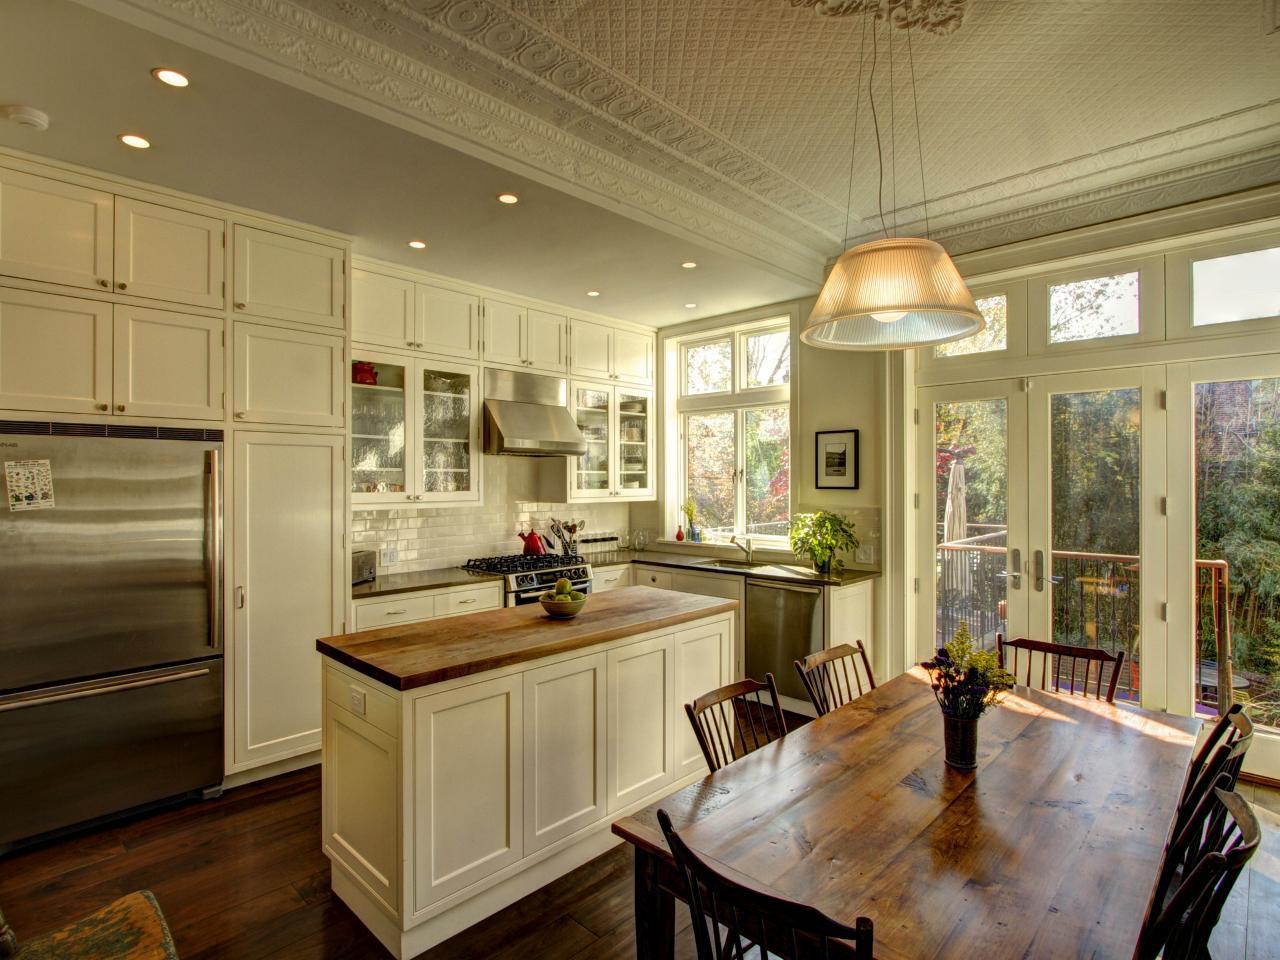 Kitchen Window Treatments Ideas HGTV Pictures amp Tips